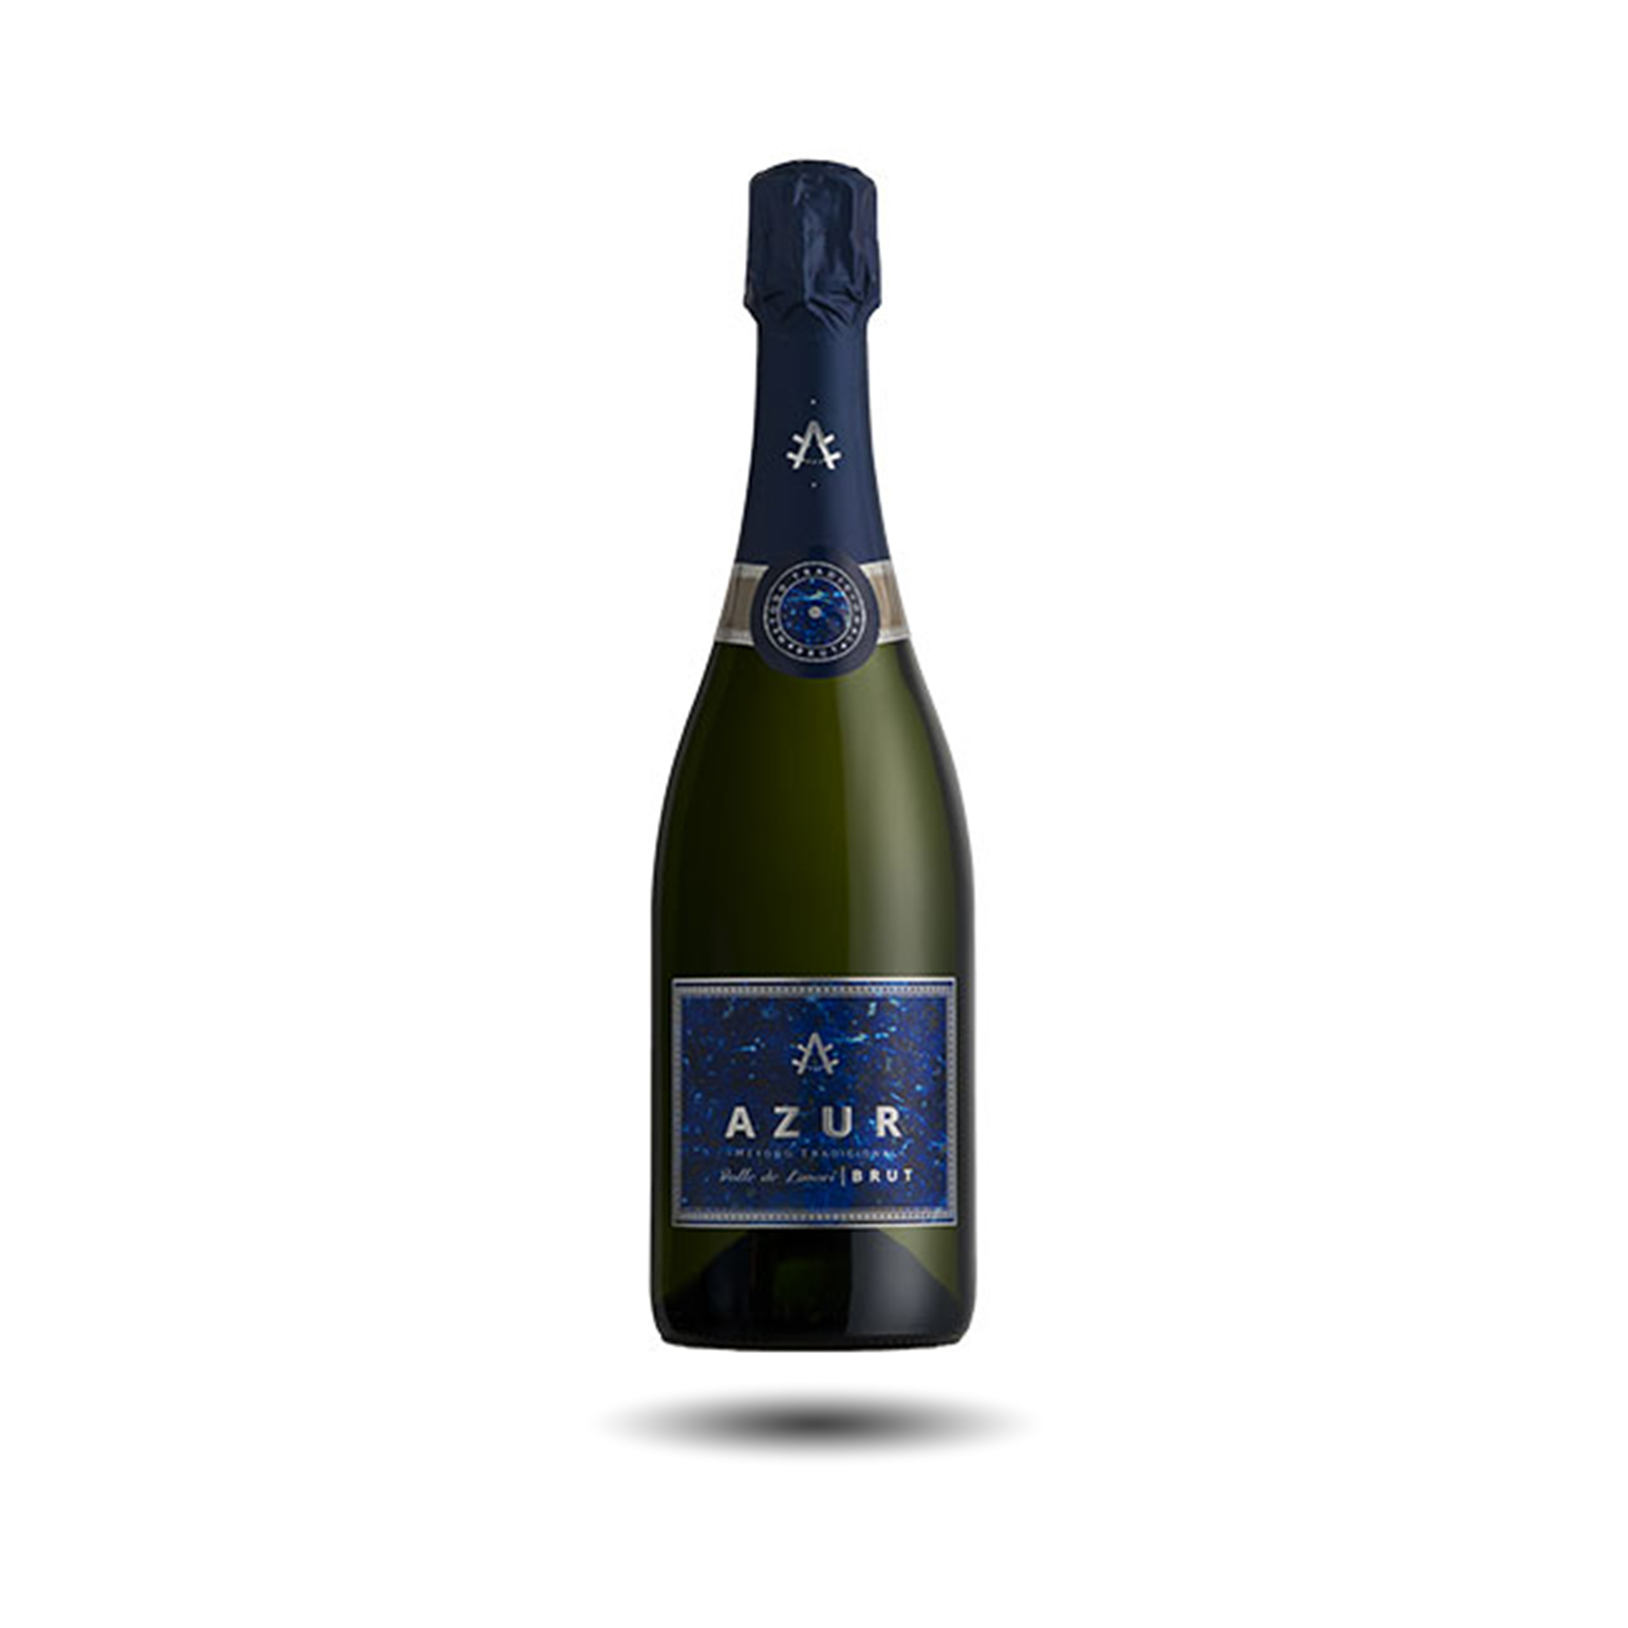 Azur - Brut